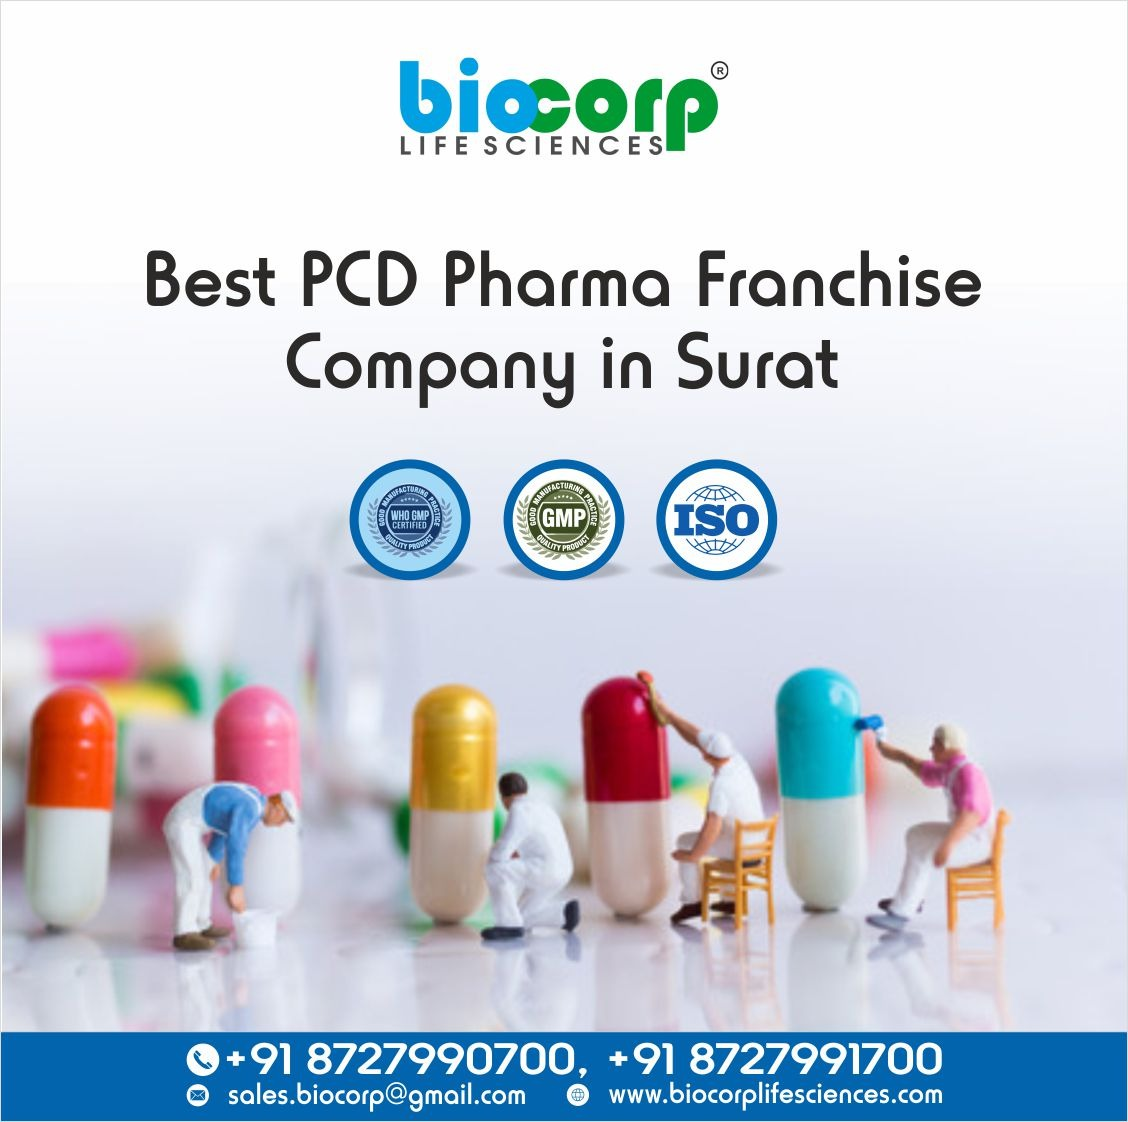 Best PCD Pharma Franchise Company in Surat